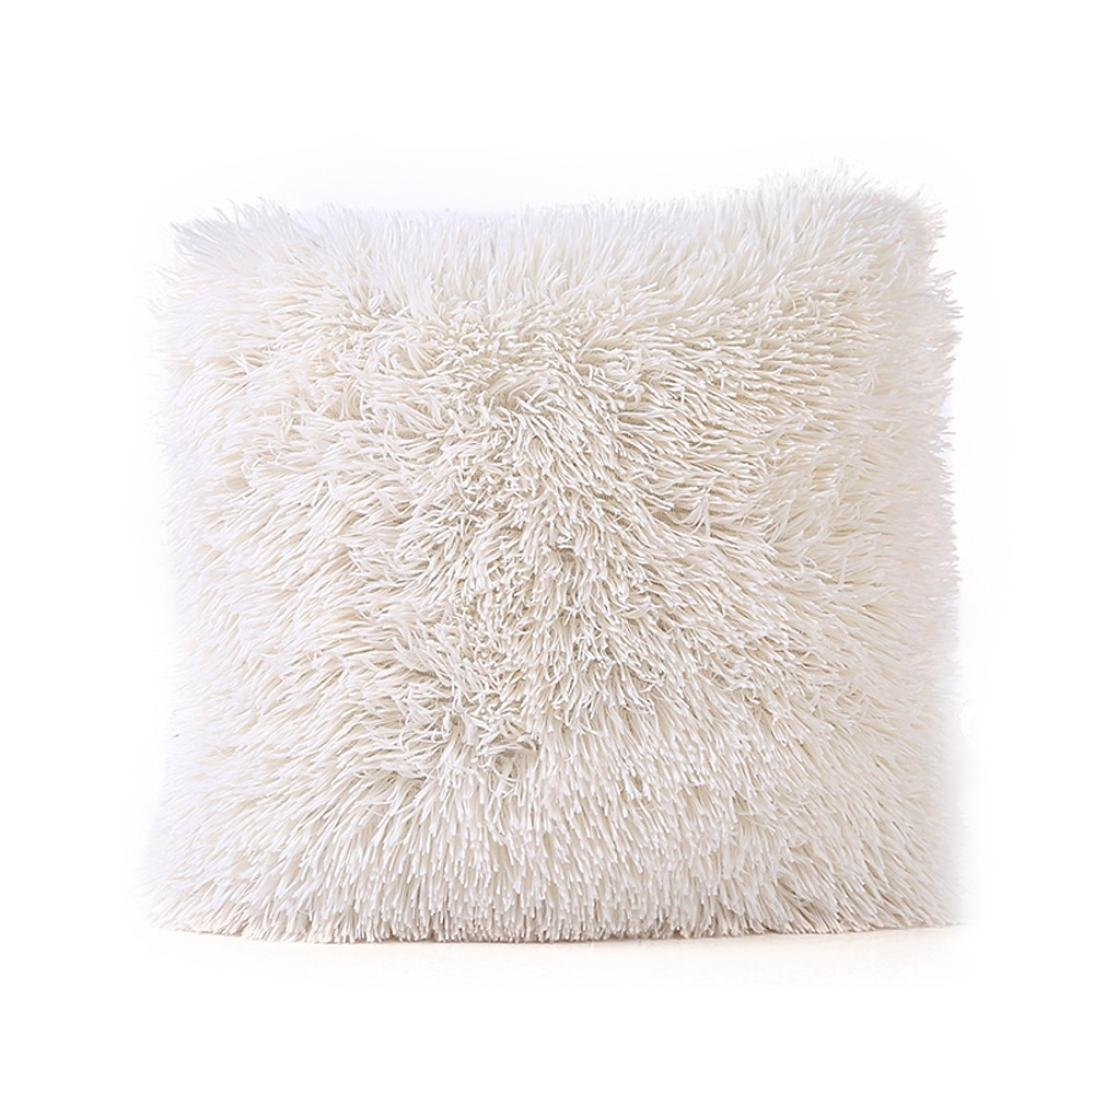 Viahwyt Throw Pillow Case Sofa Plush Waist Seaside Decorative Cuddly Cushion Cover Home Coffee Shop Decor